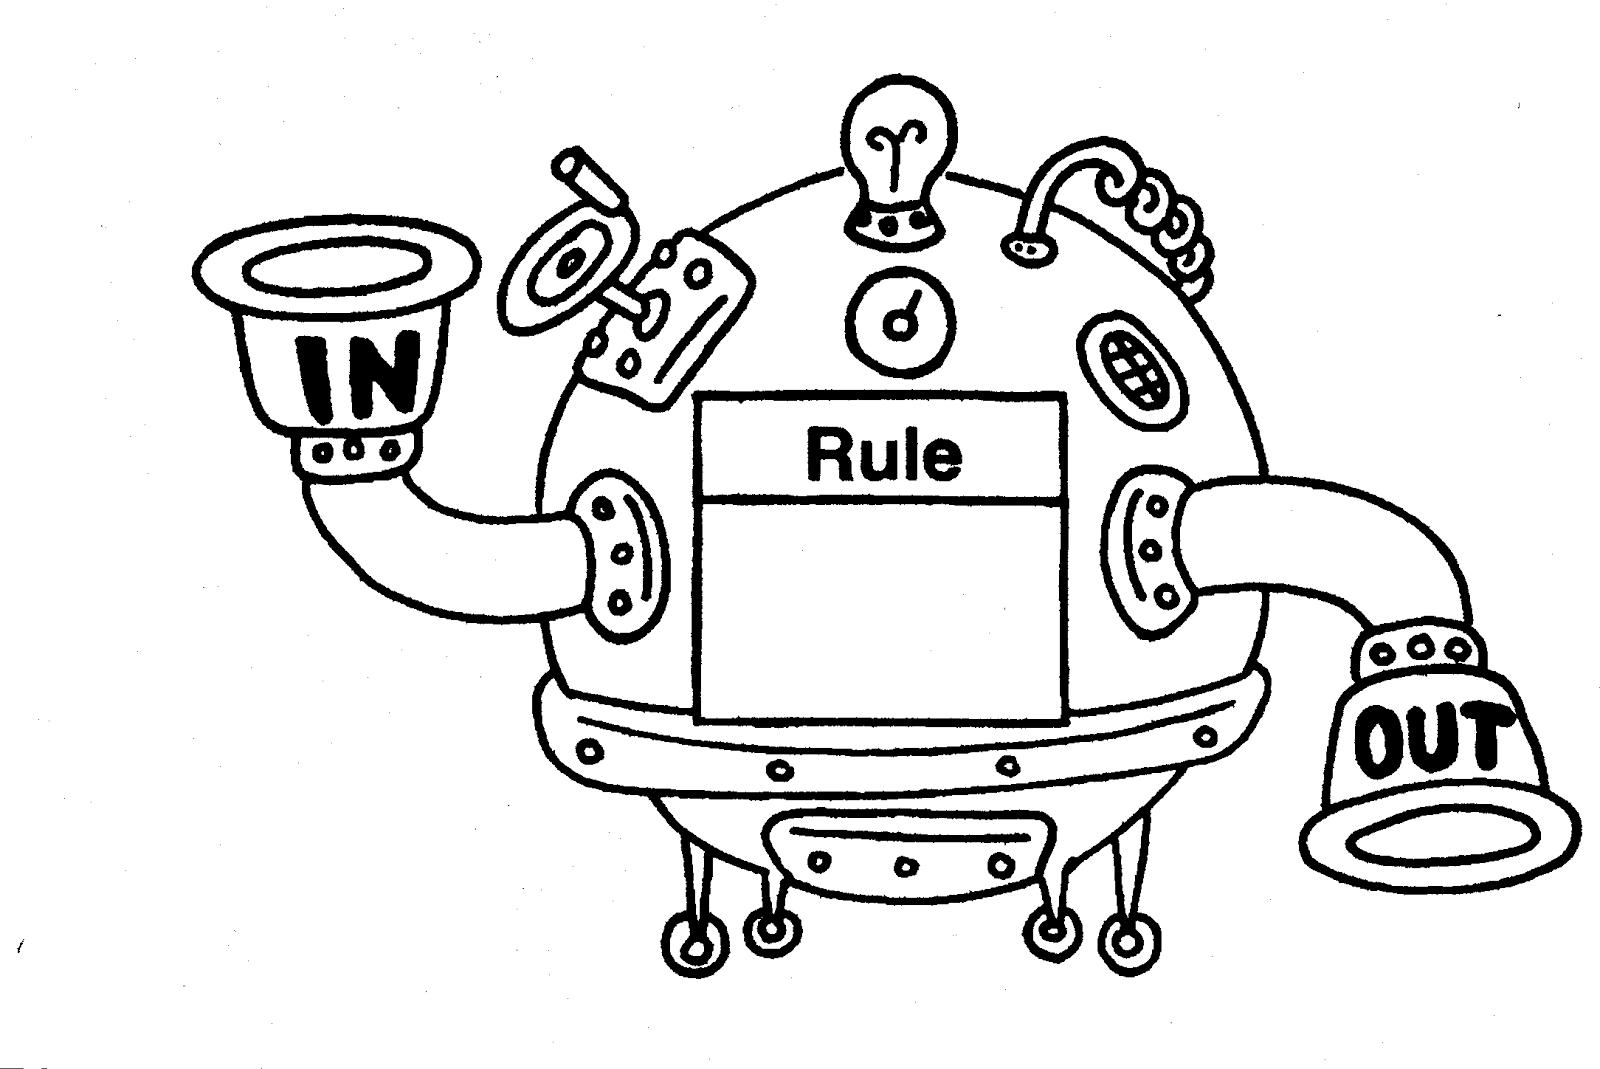 Enterprises Grow Bullish On Artificial Intelligence